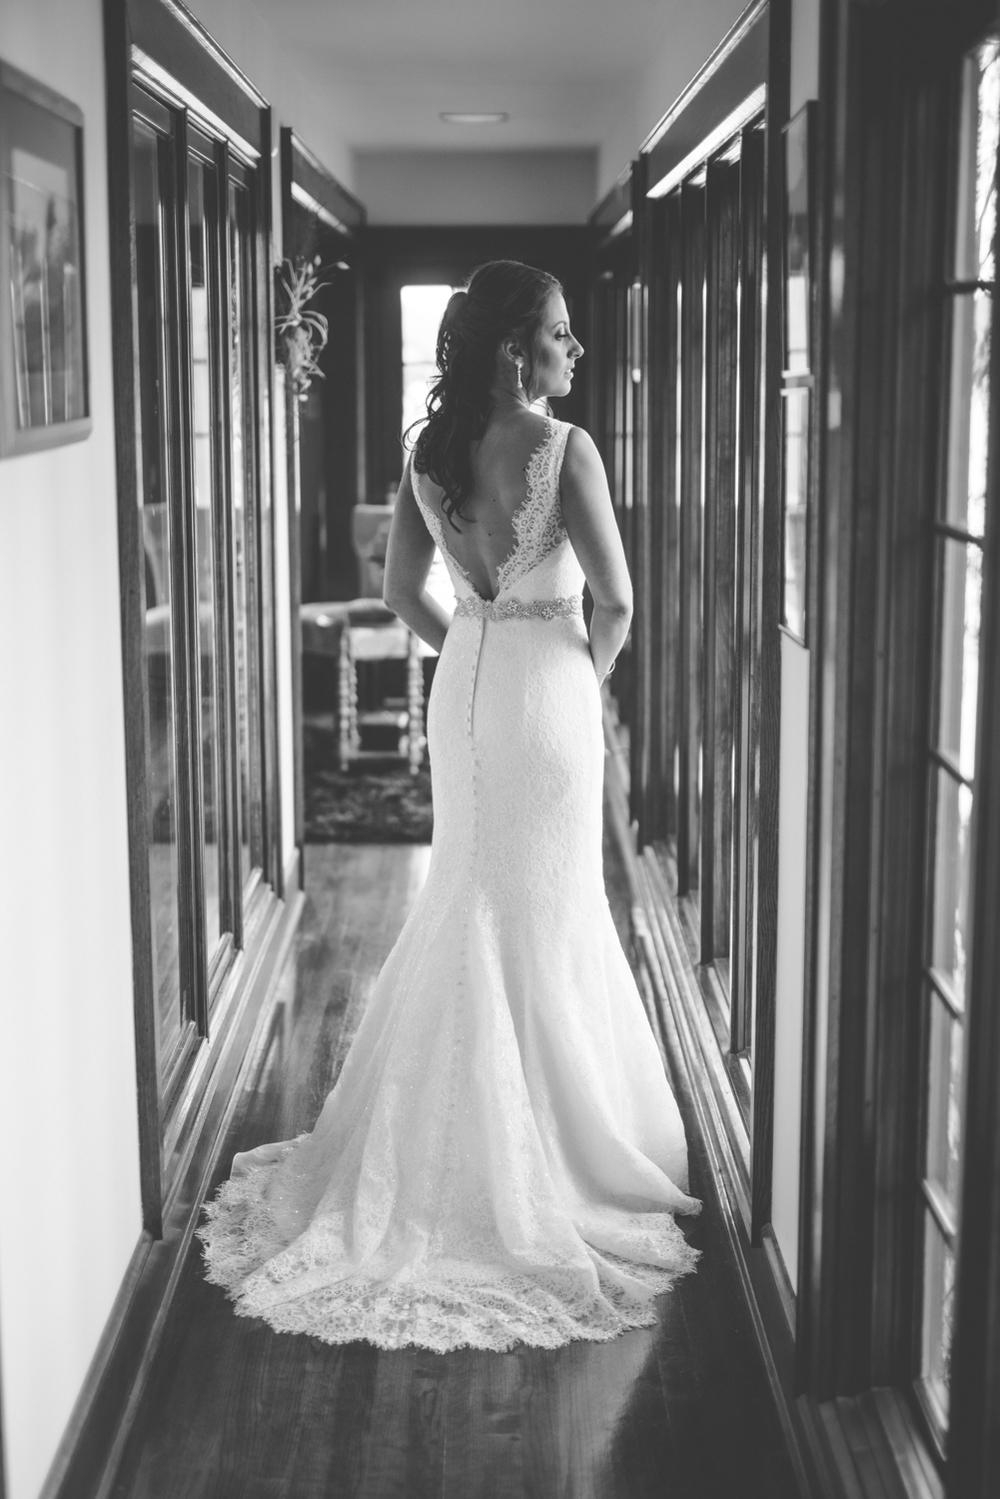 celebrationsatthereservoir-wedding-virginiaweddingphotographer-14.jpg